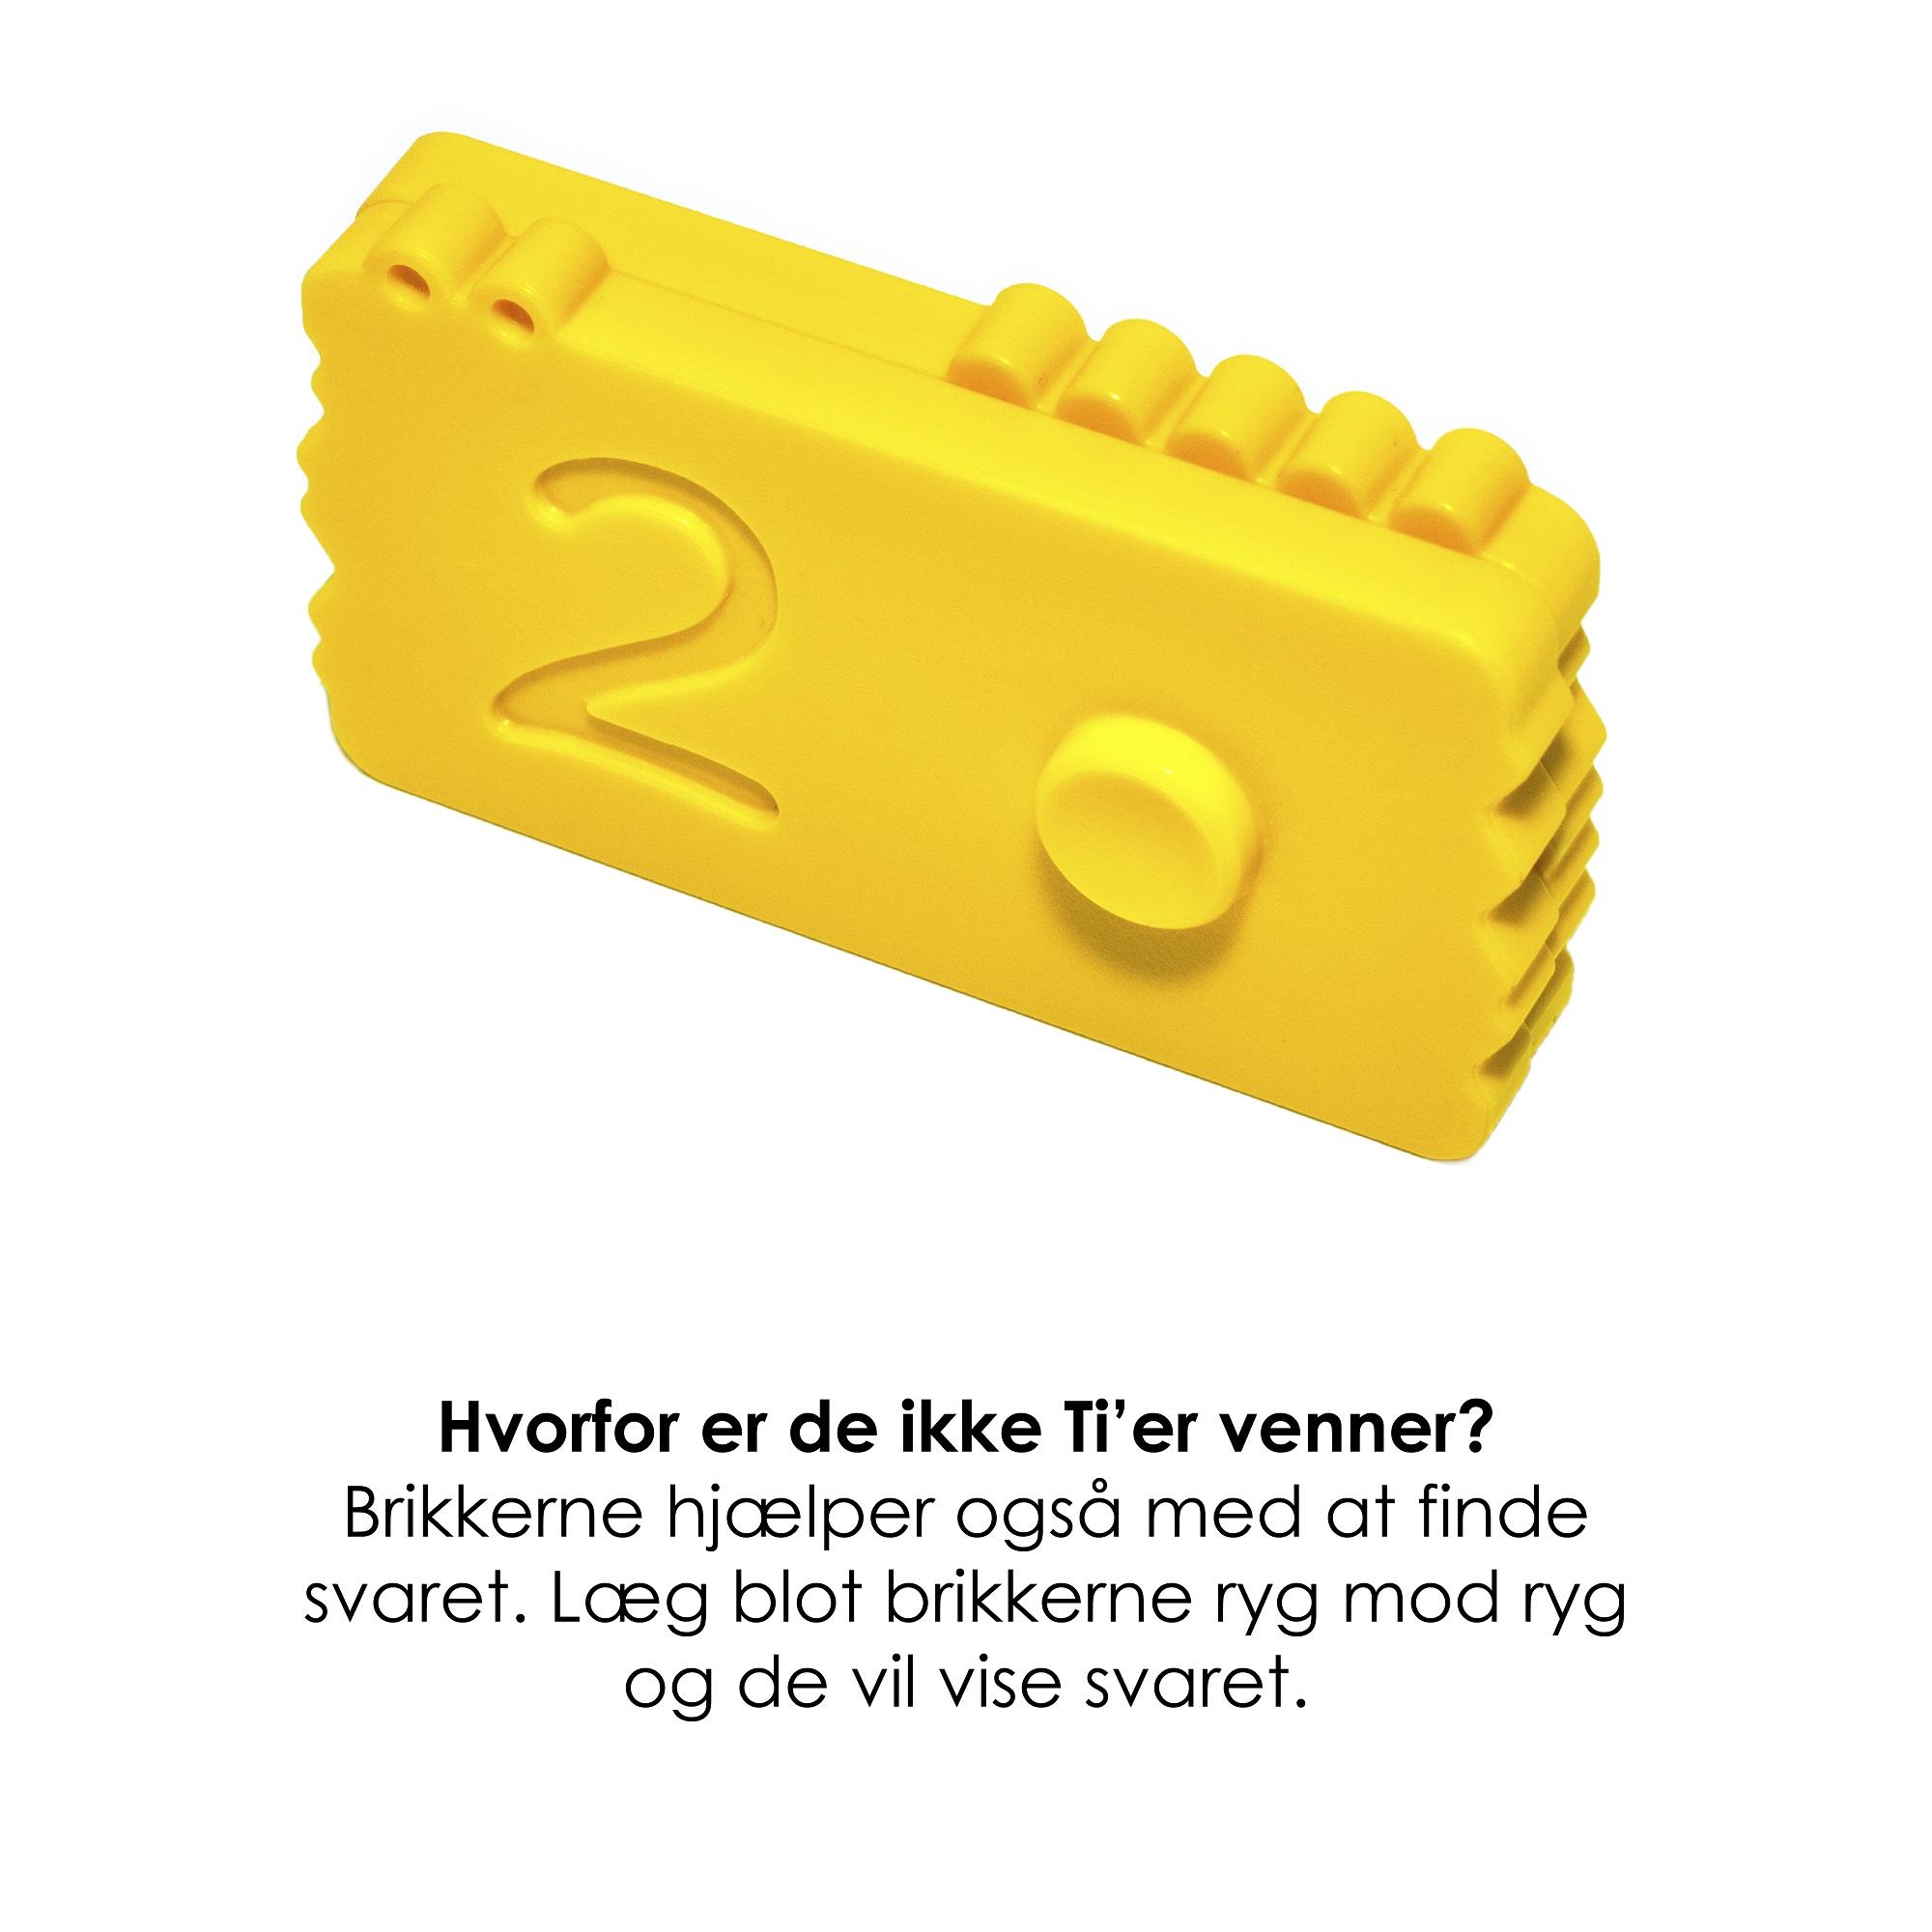 newmero_bricks_DK_feature-02.jpg